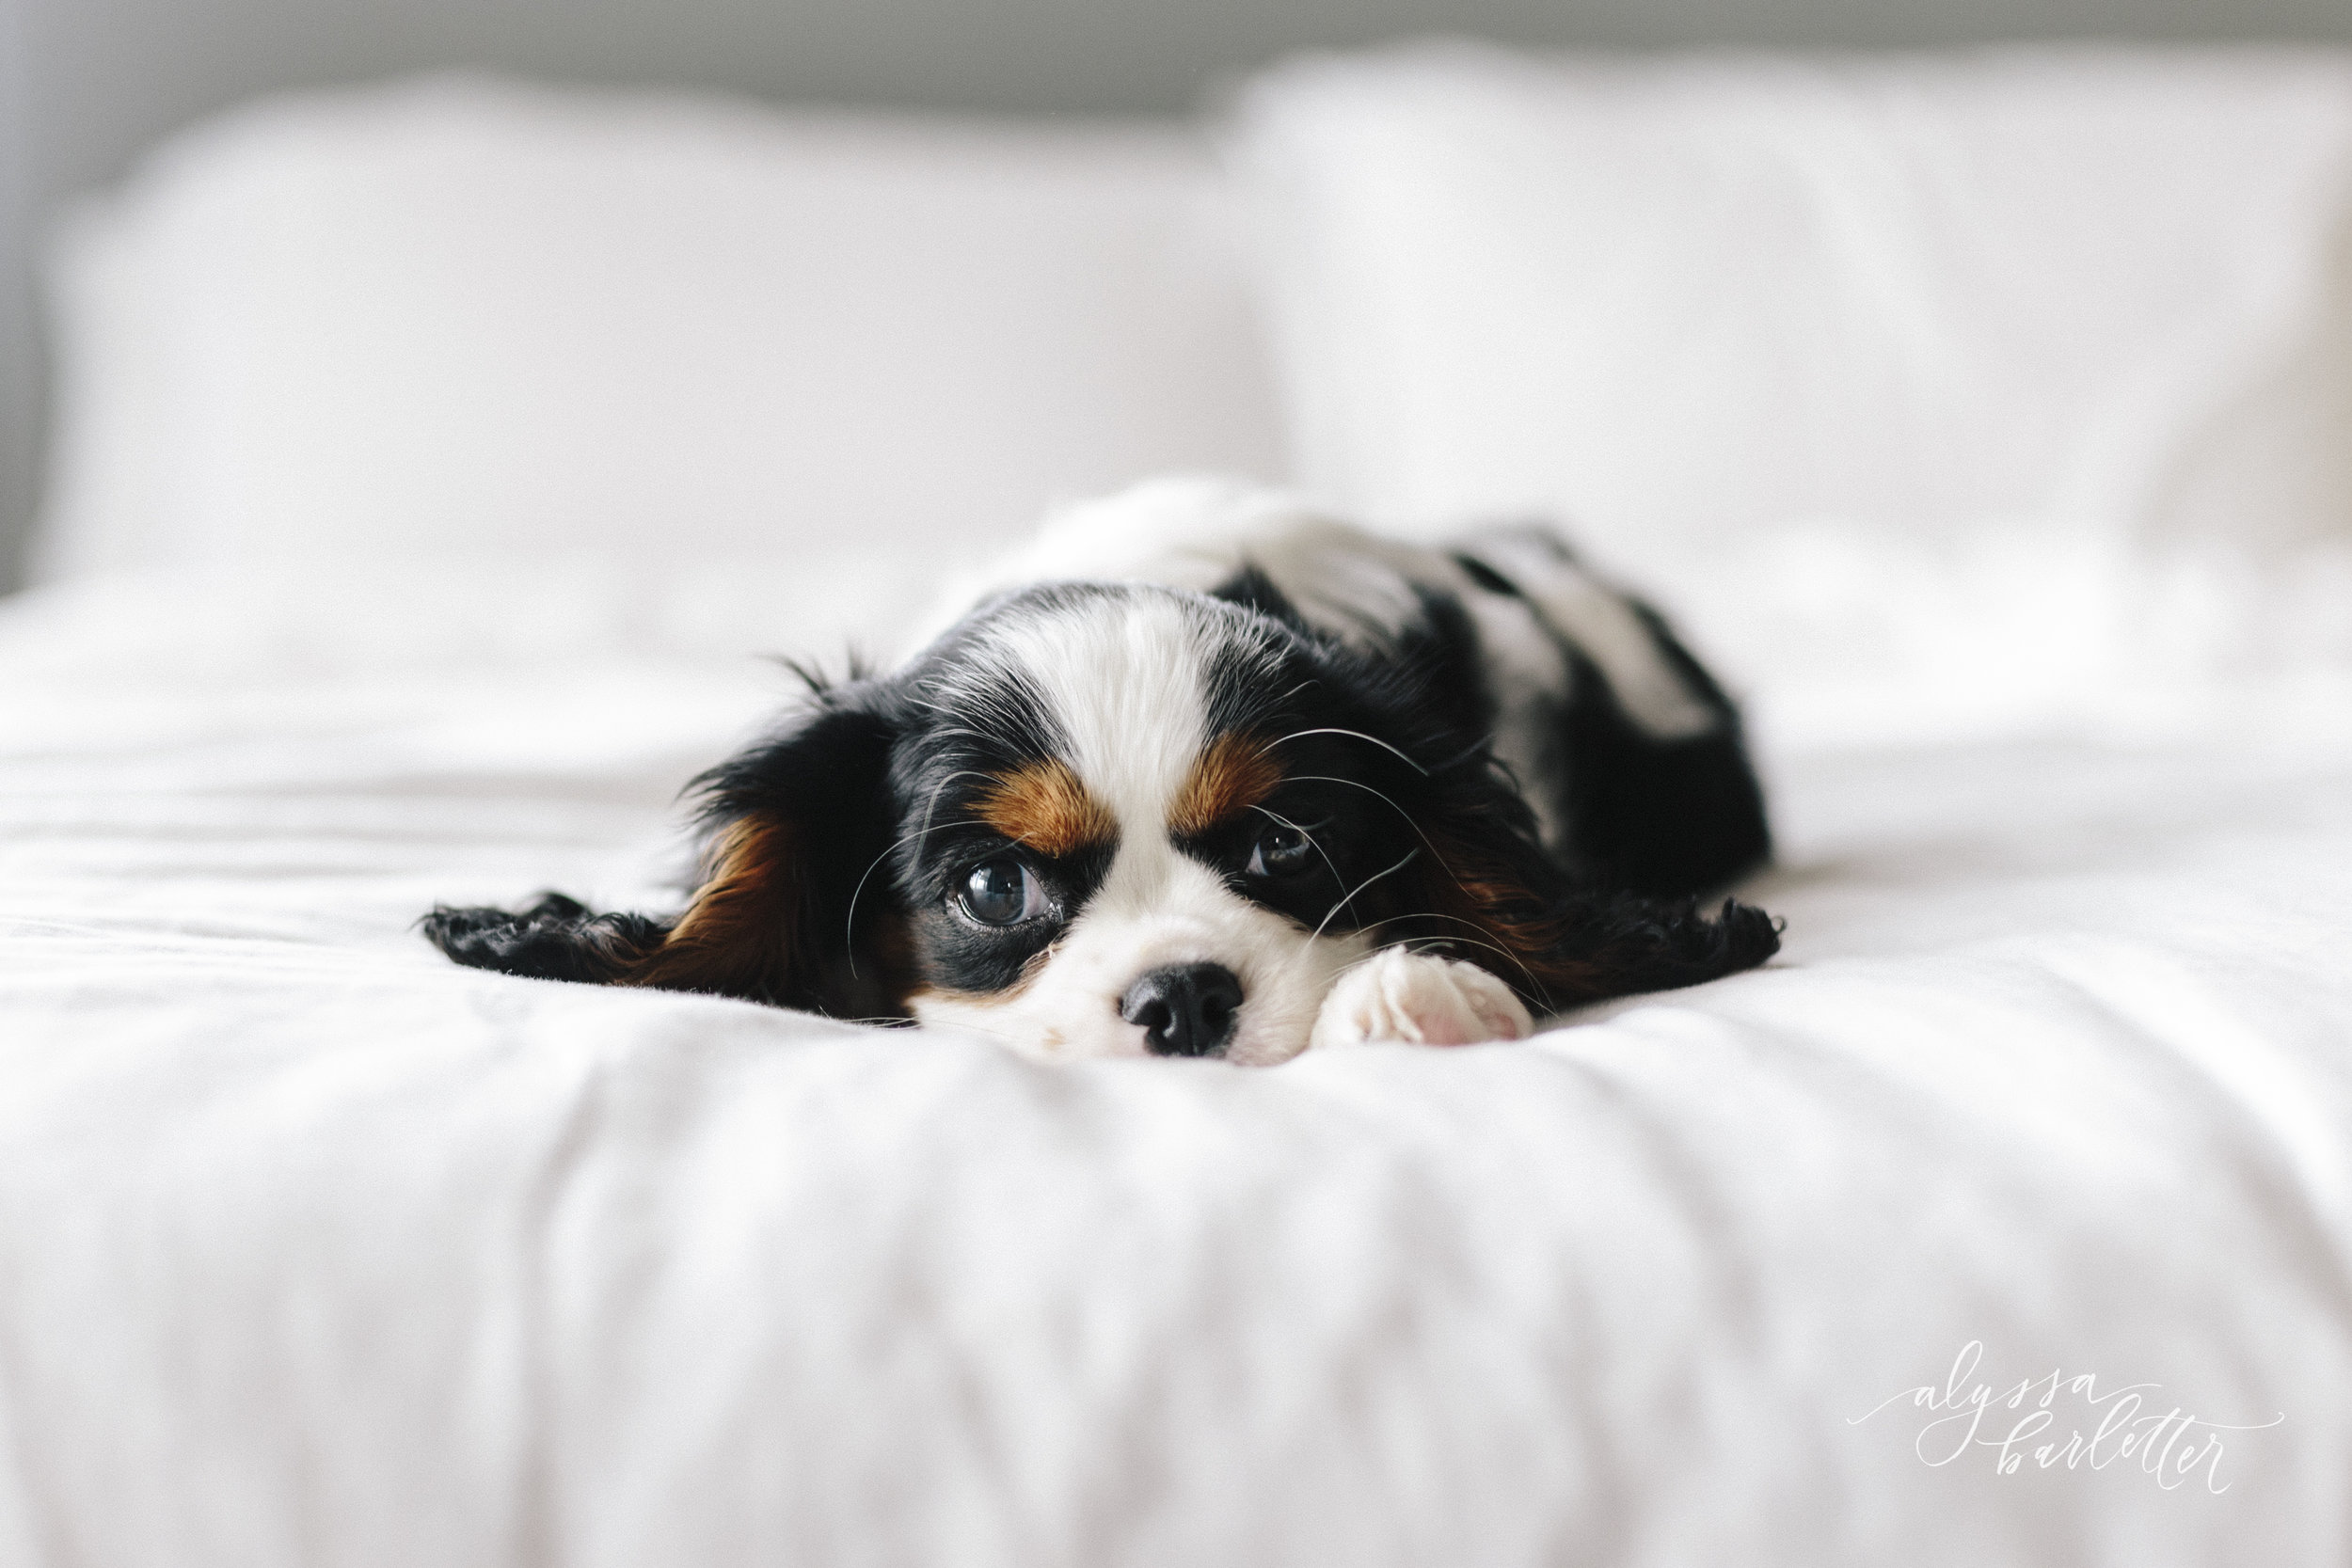 alyssa barletter photography lifestyle apartment new puppy-1-3.jpg